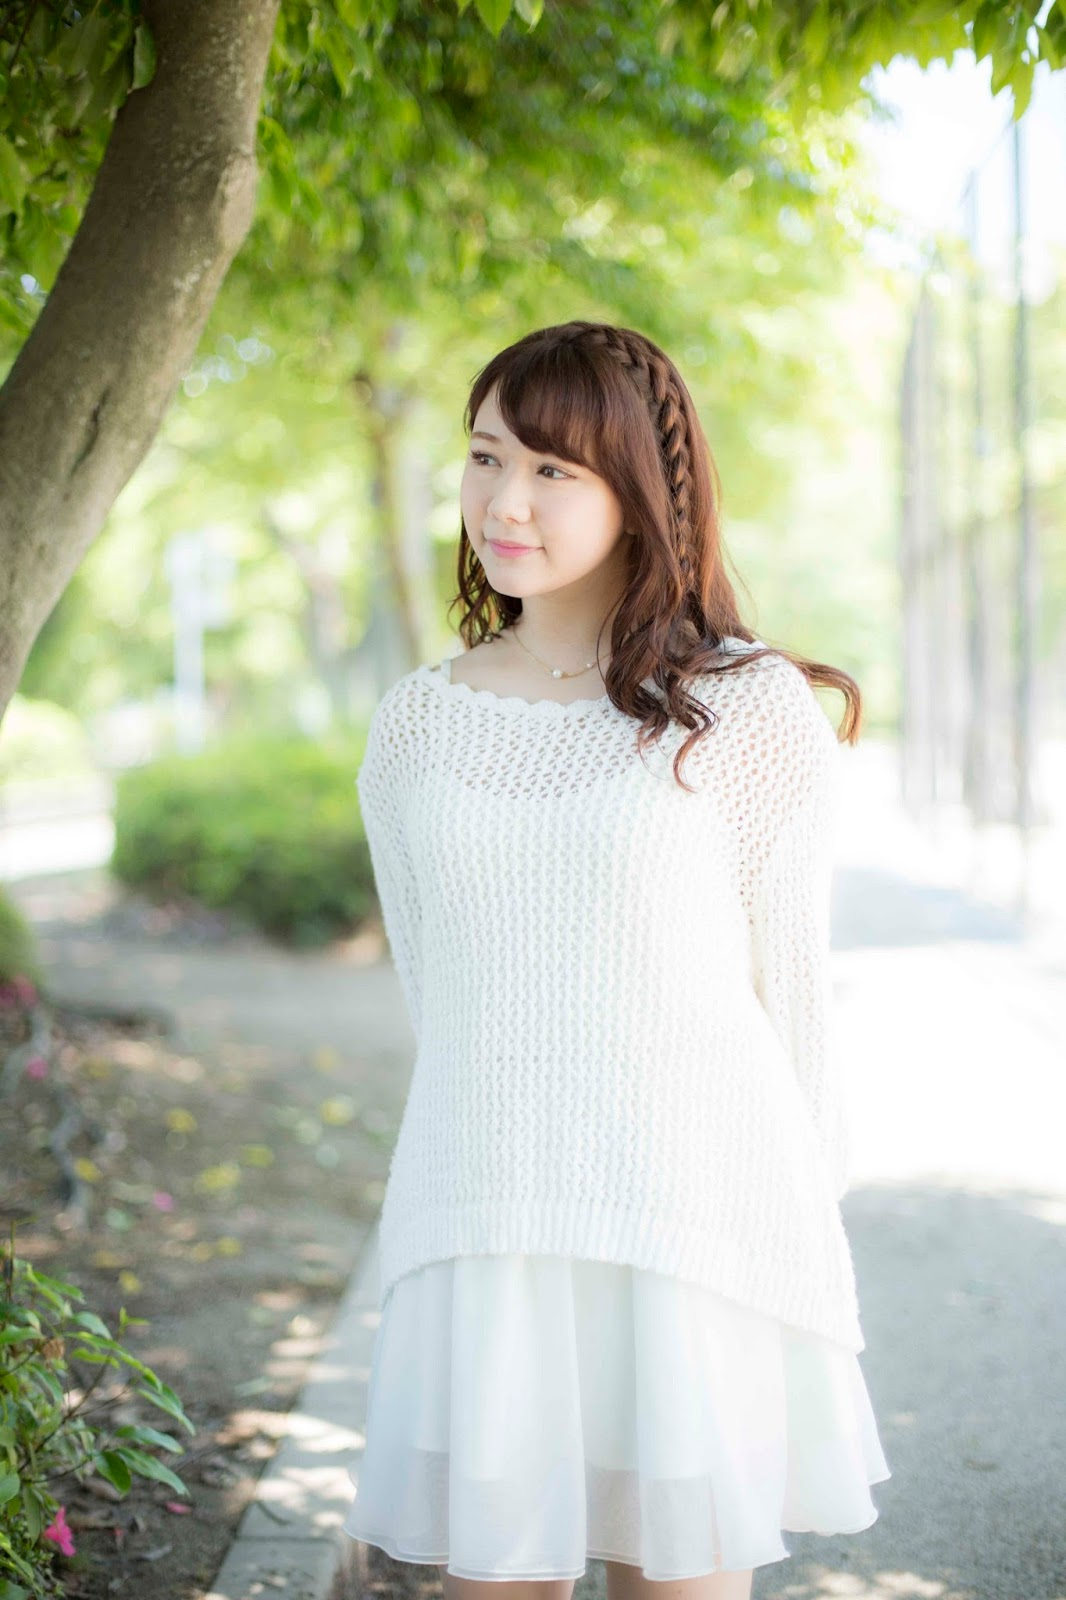 Murashige Anna 村重杏奈 HKT48, B.L.T Web 2016年09月29日号